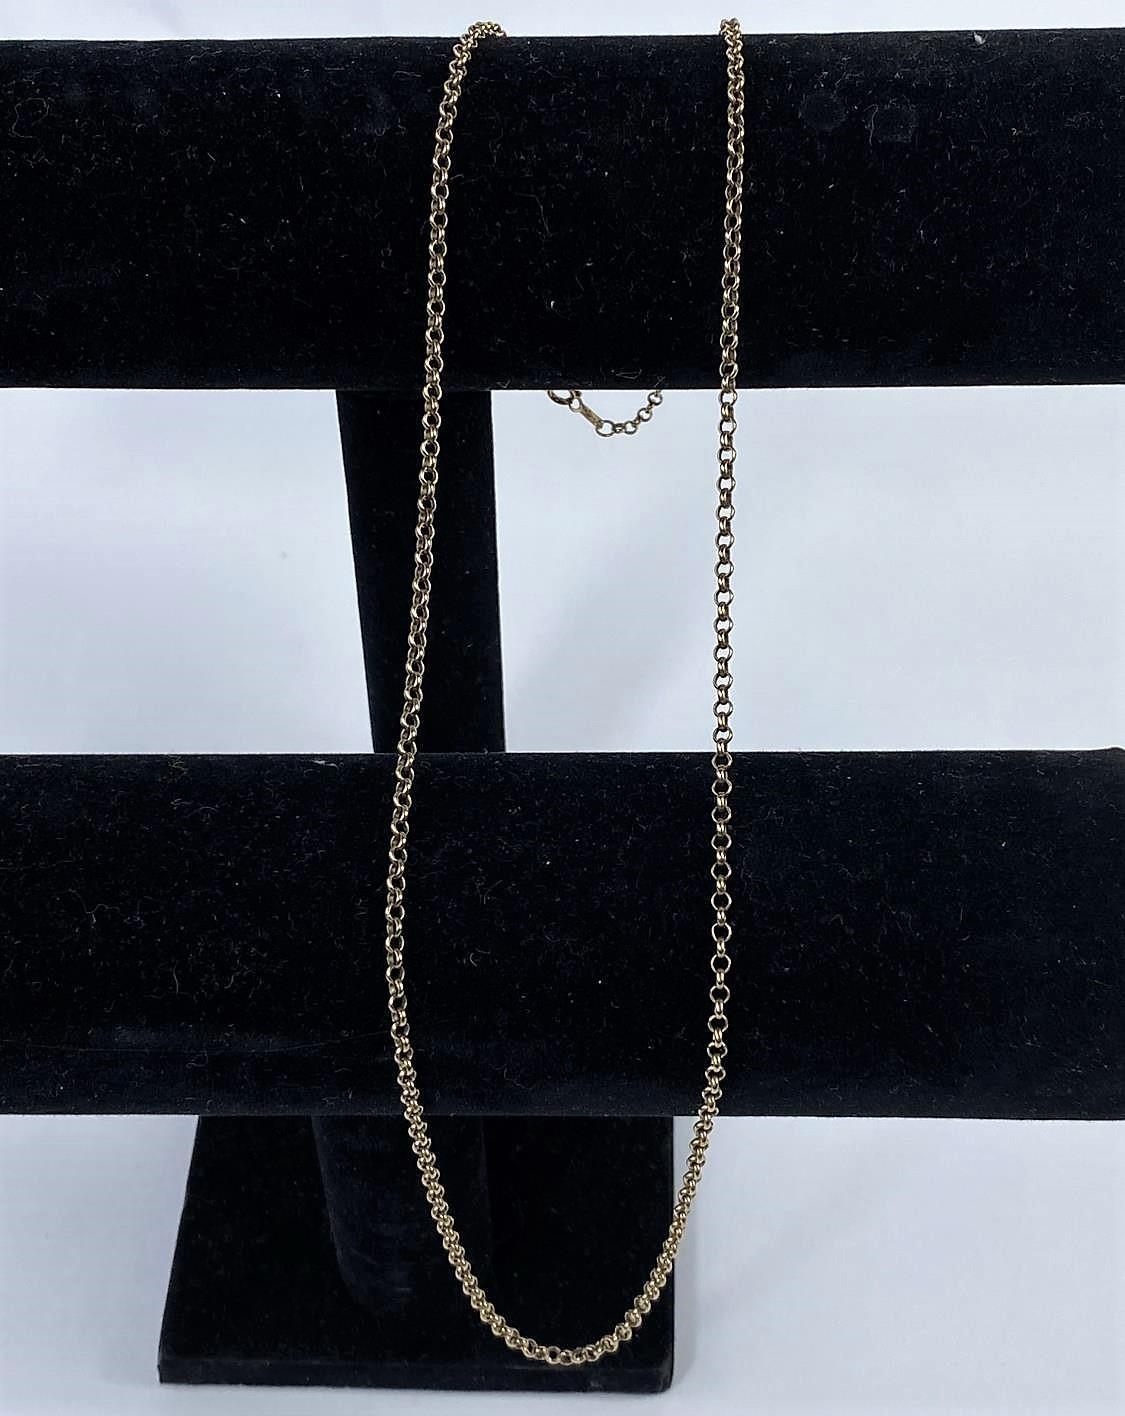 A fine belcher chain, stamped '375', 9.6 gm